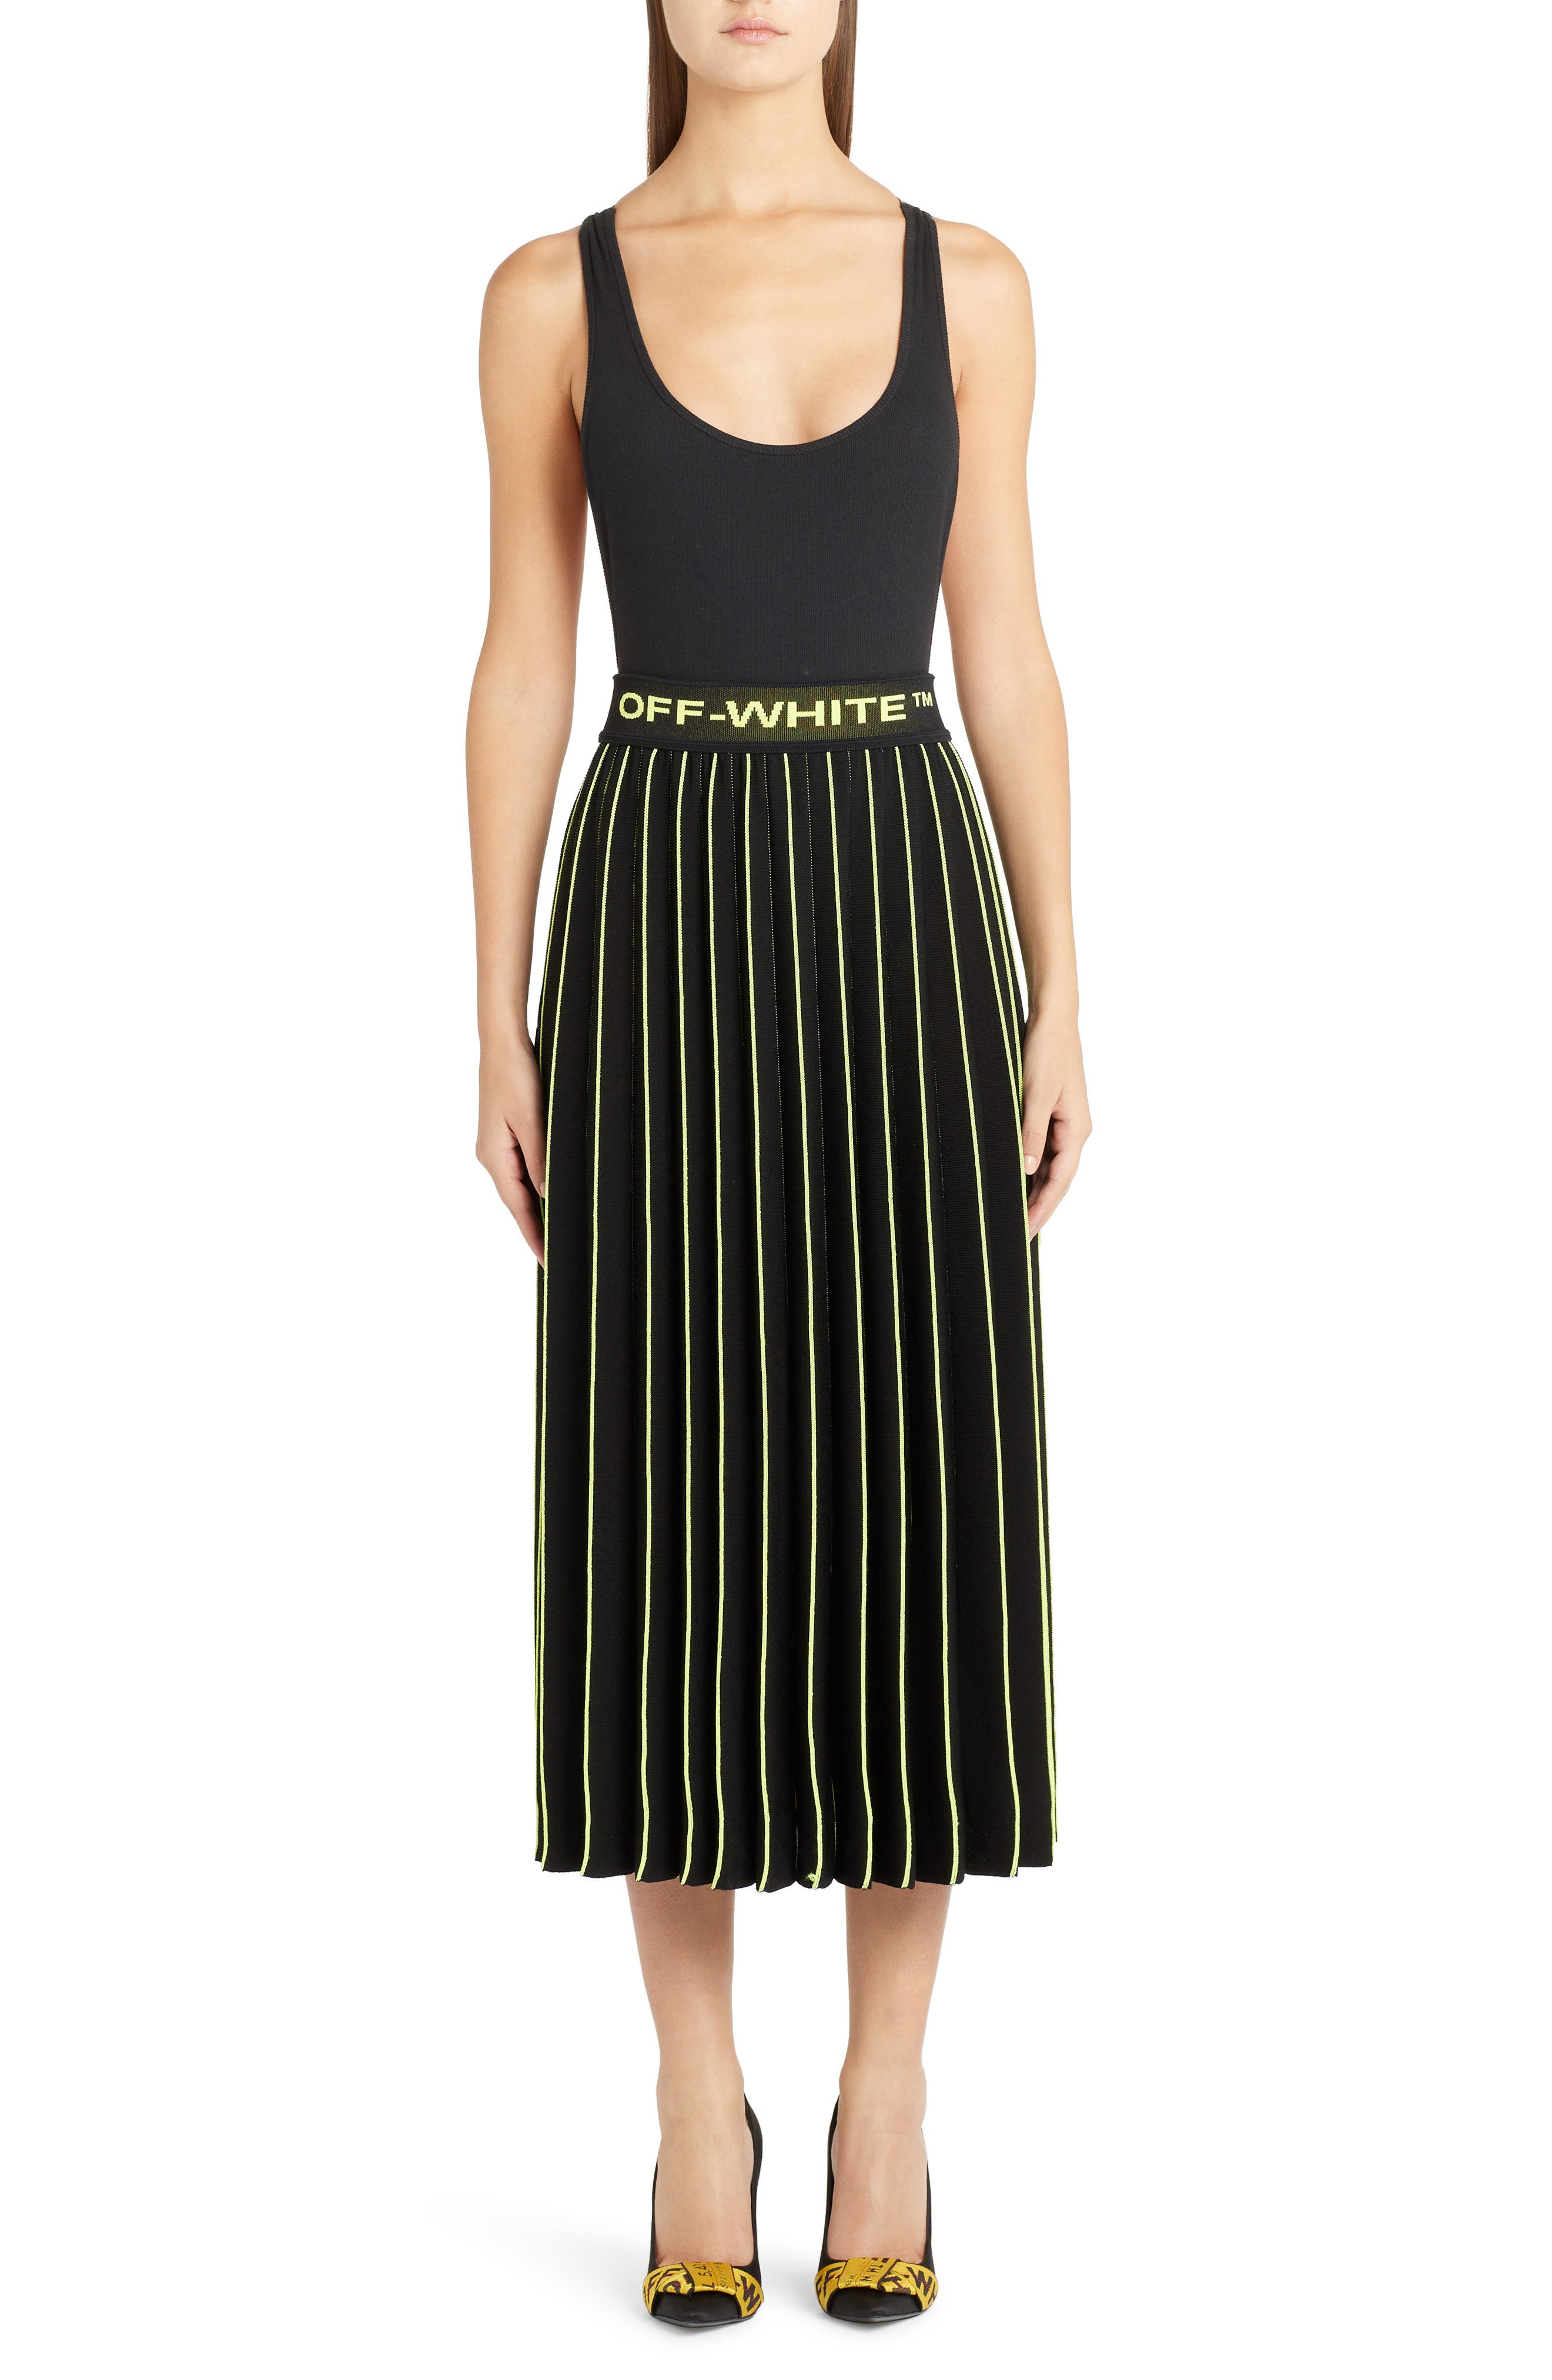 OFF-WHITE, Plissé Sweater Skirt, Alternate thumbnail 6, color, BLACK